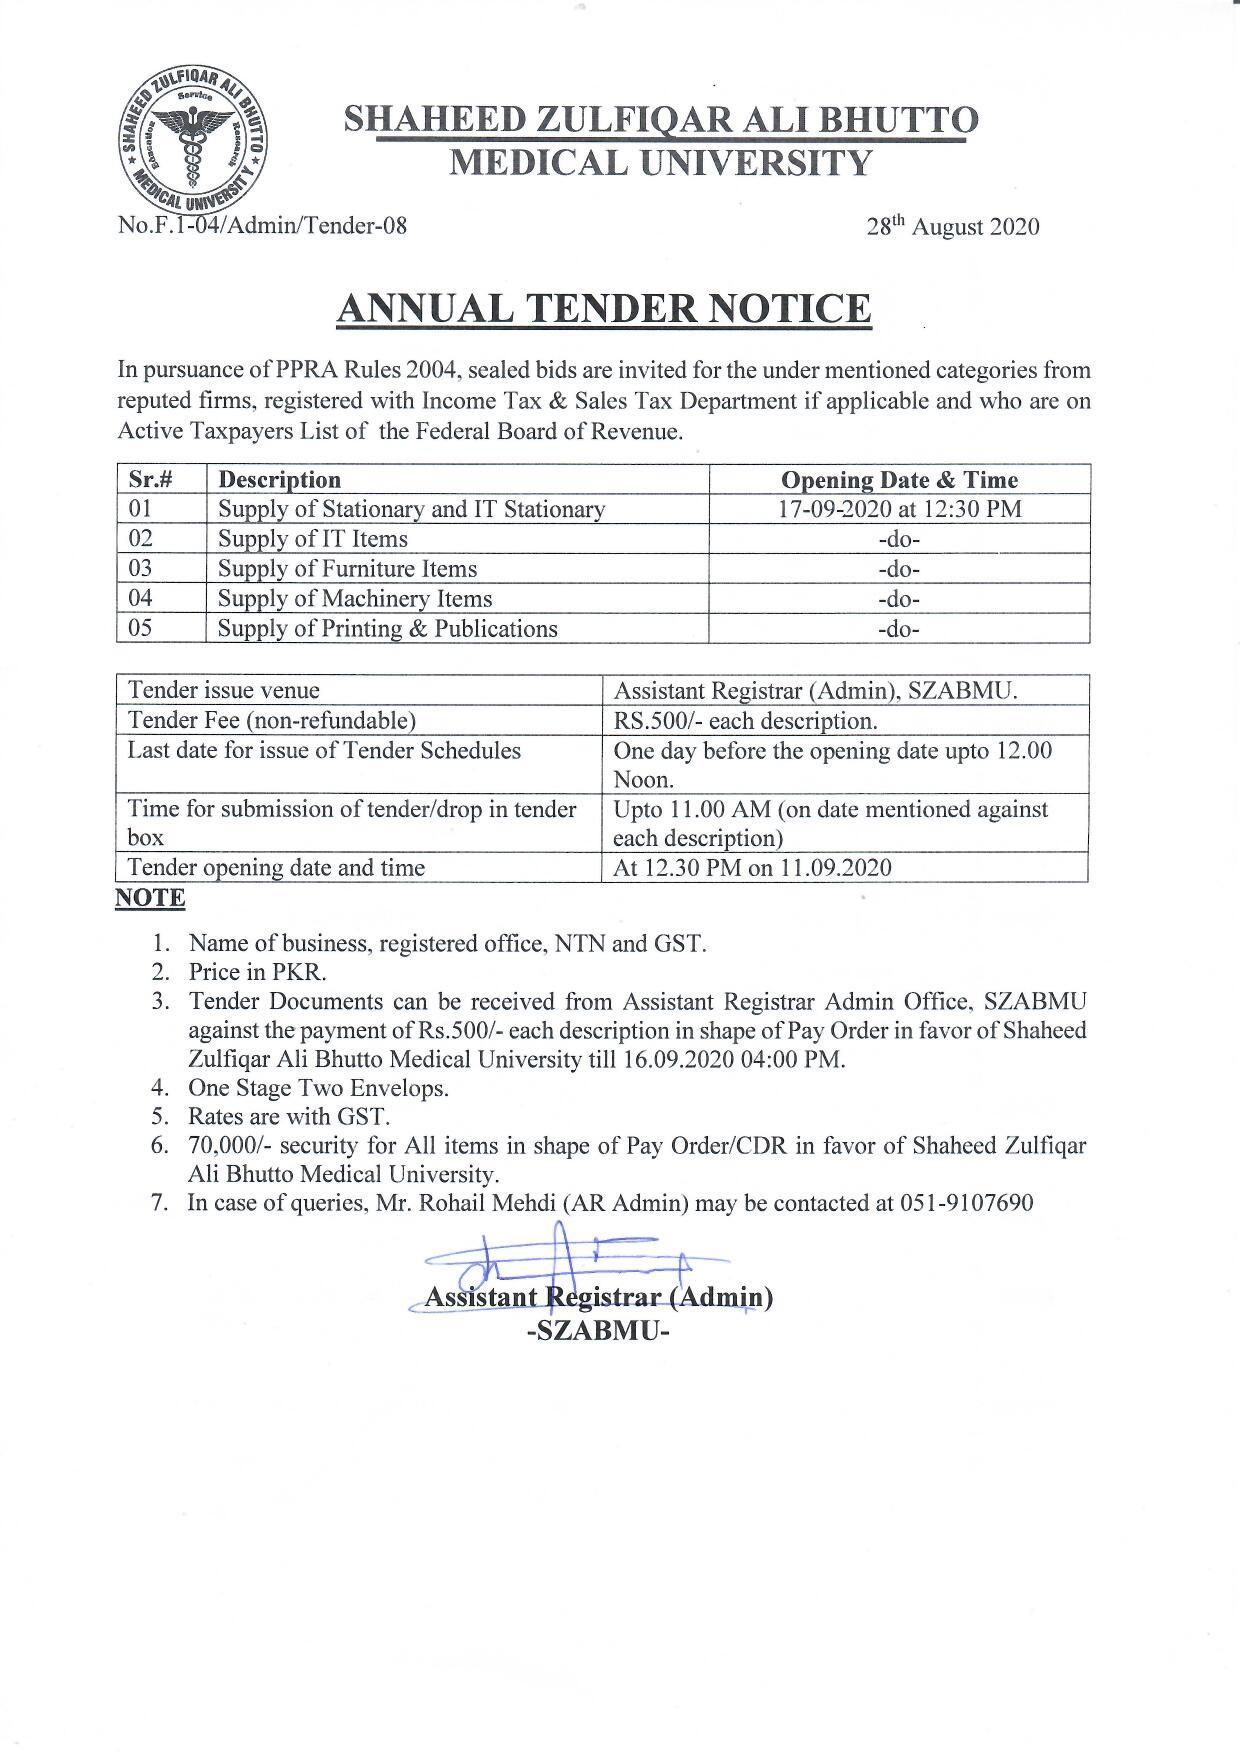 Annual Tender Notice August 2020